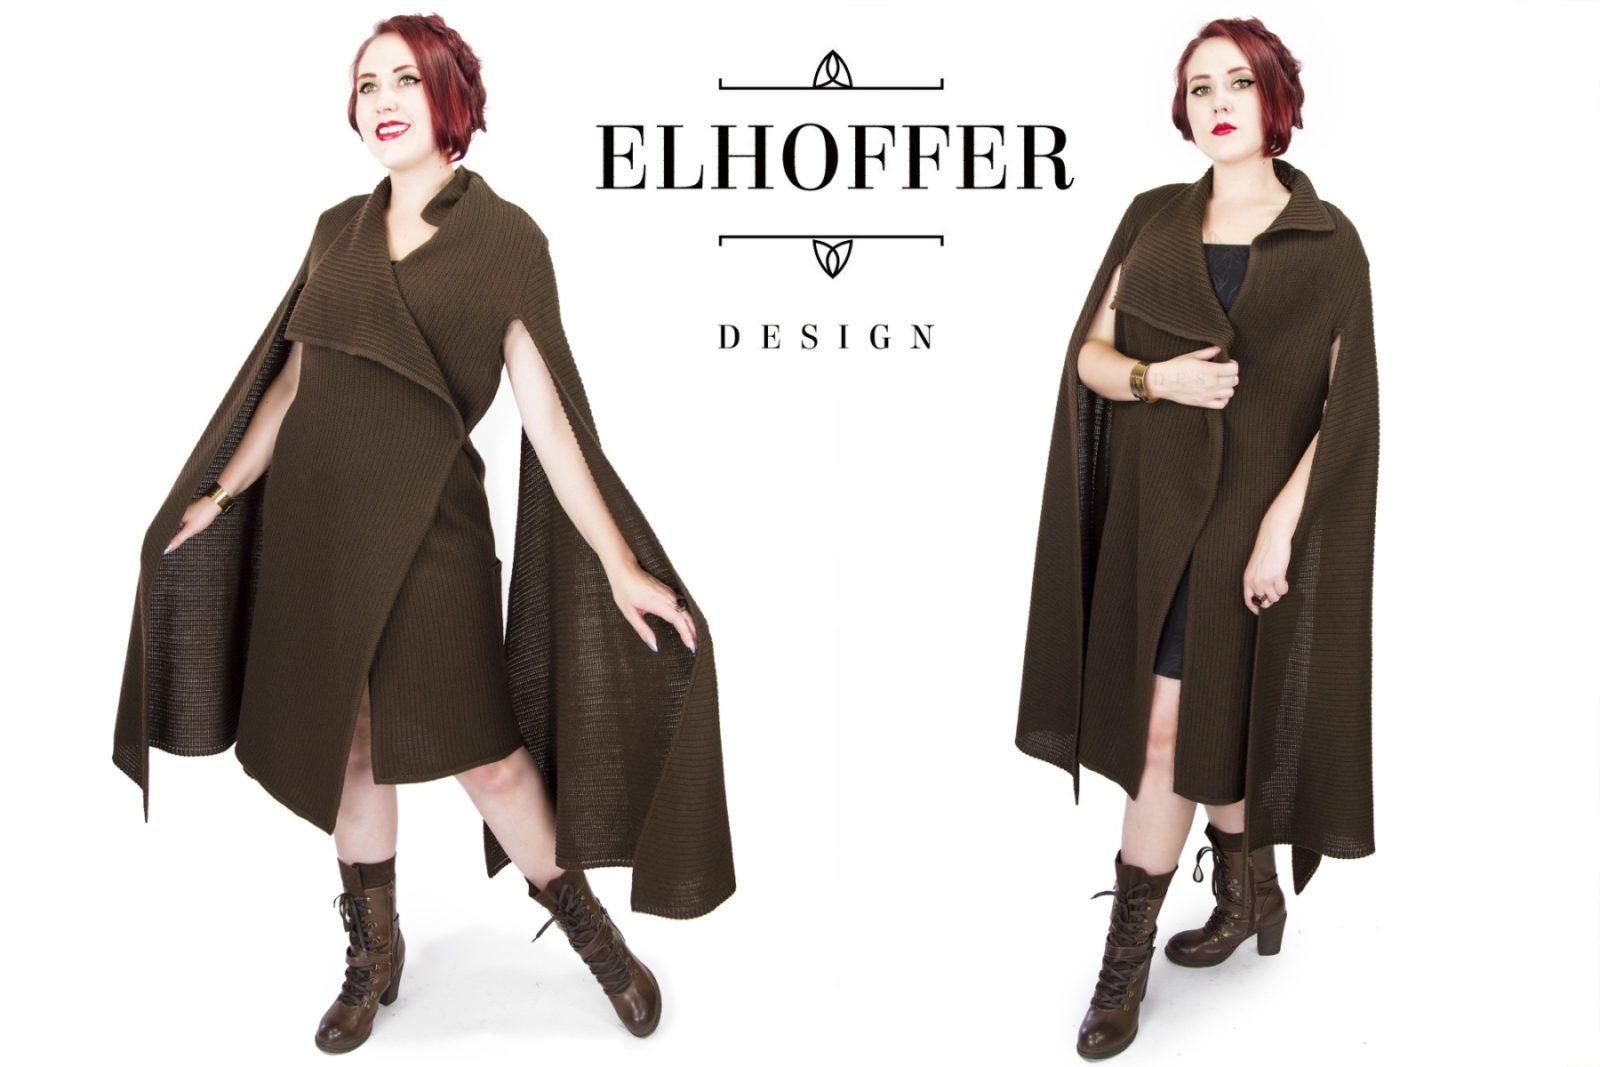 General Leia Inspired Cardigan by Elhoffer Design